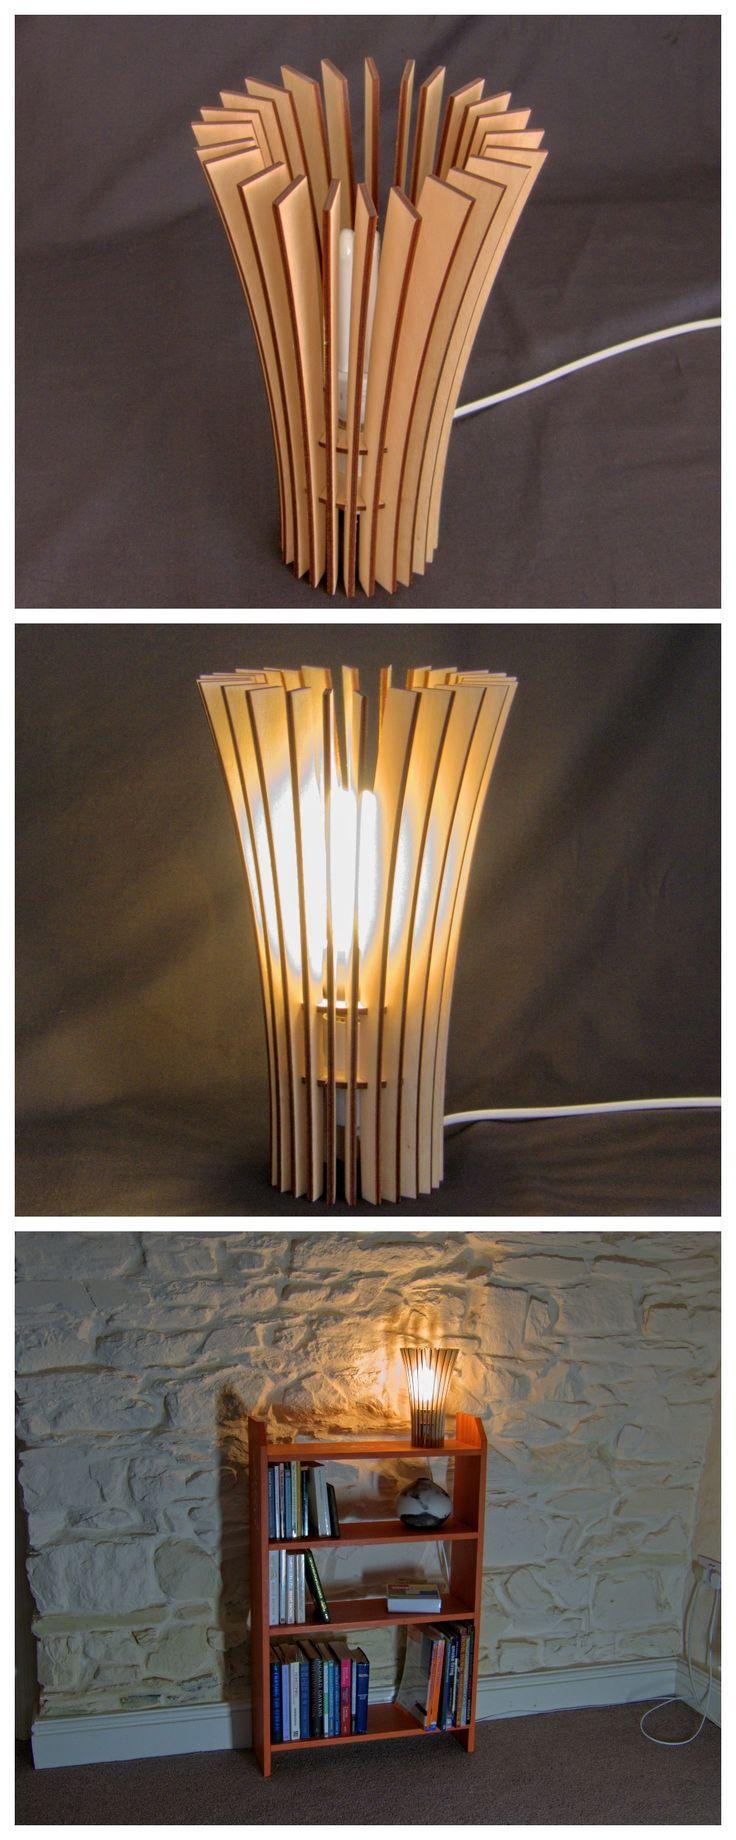 13 best Lamp Design images on Pinterest | Ceiling lights, Cover ...